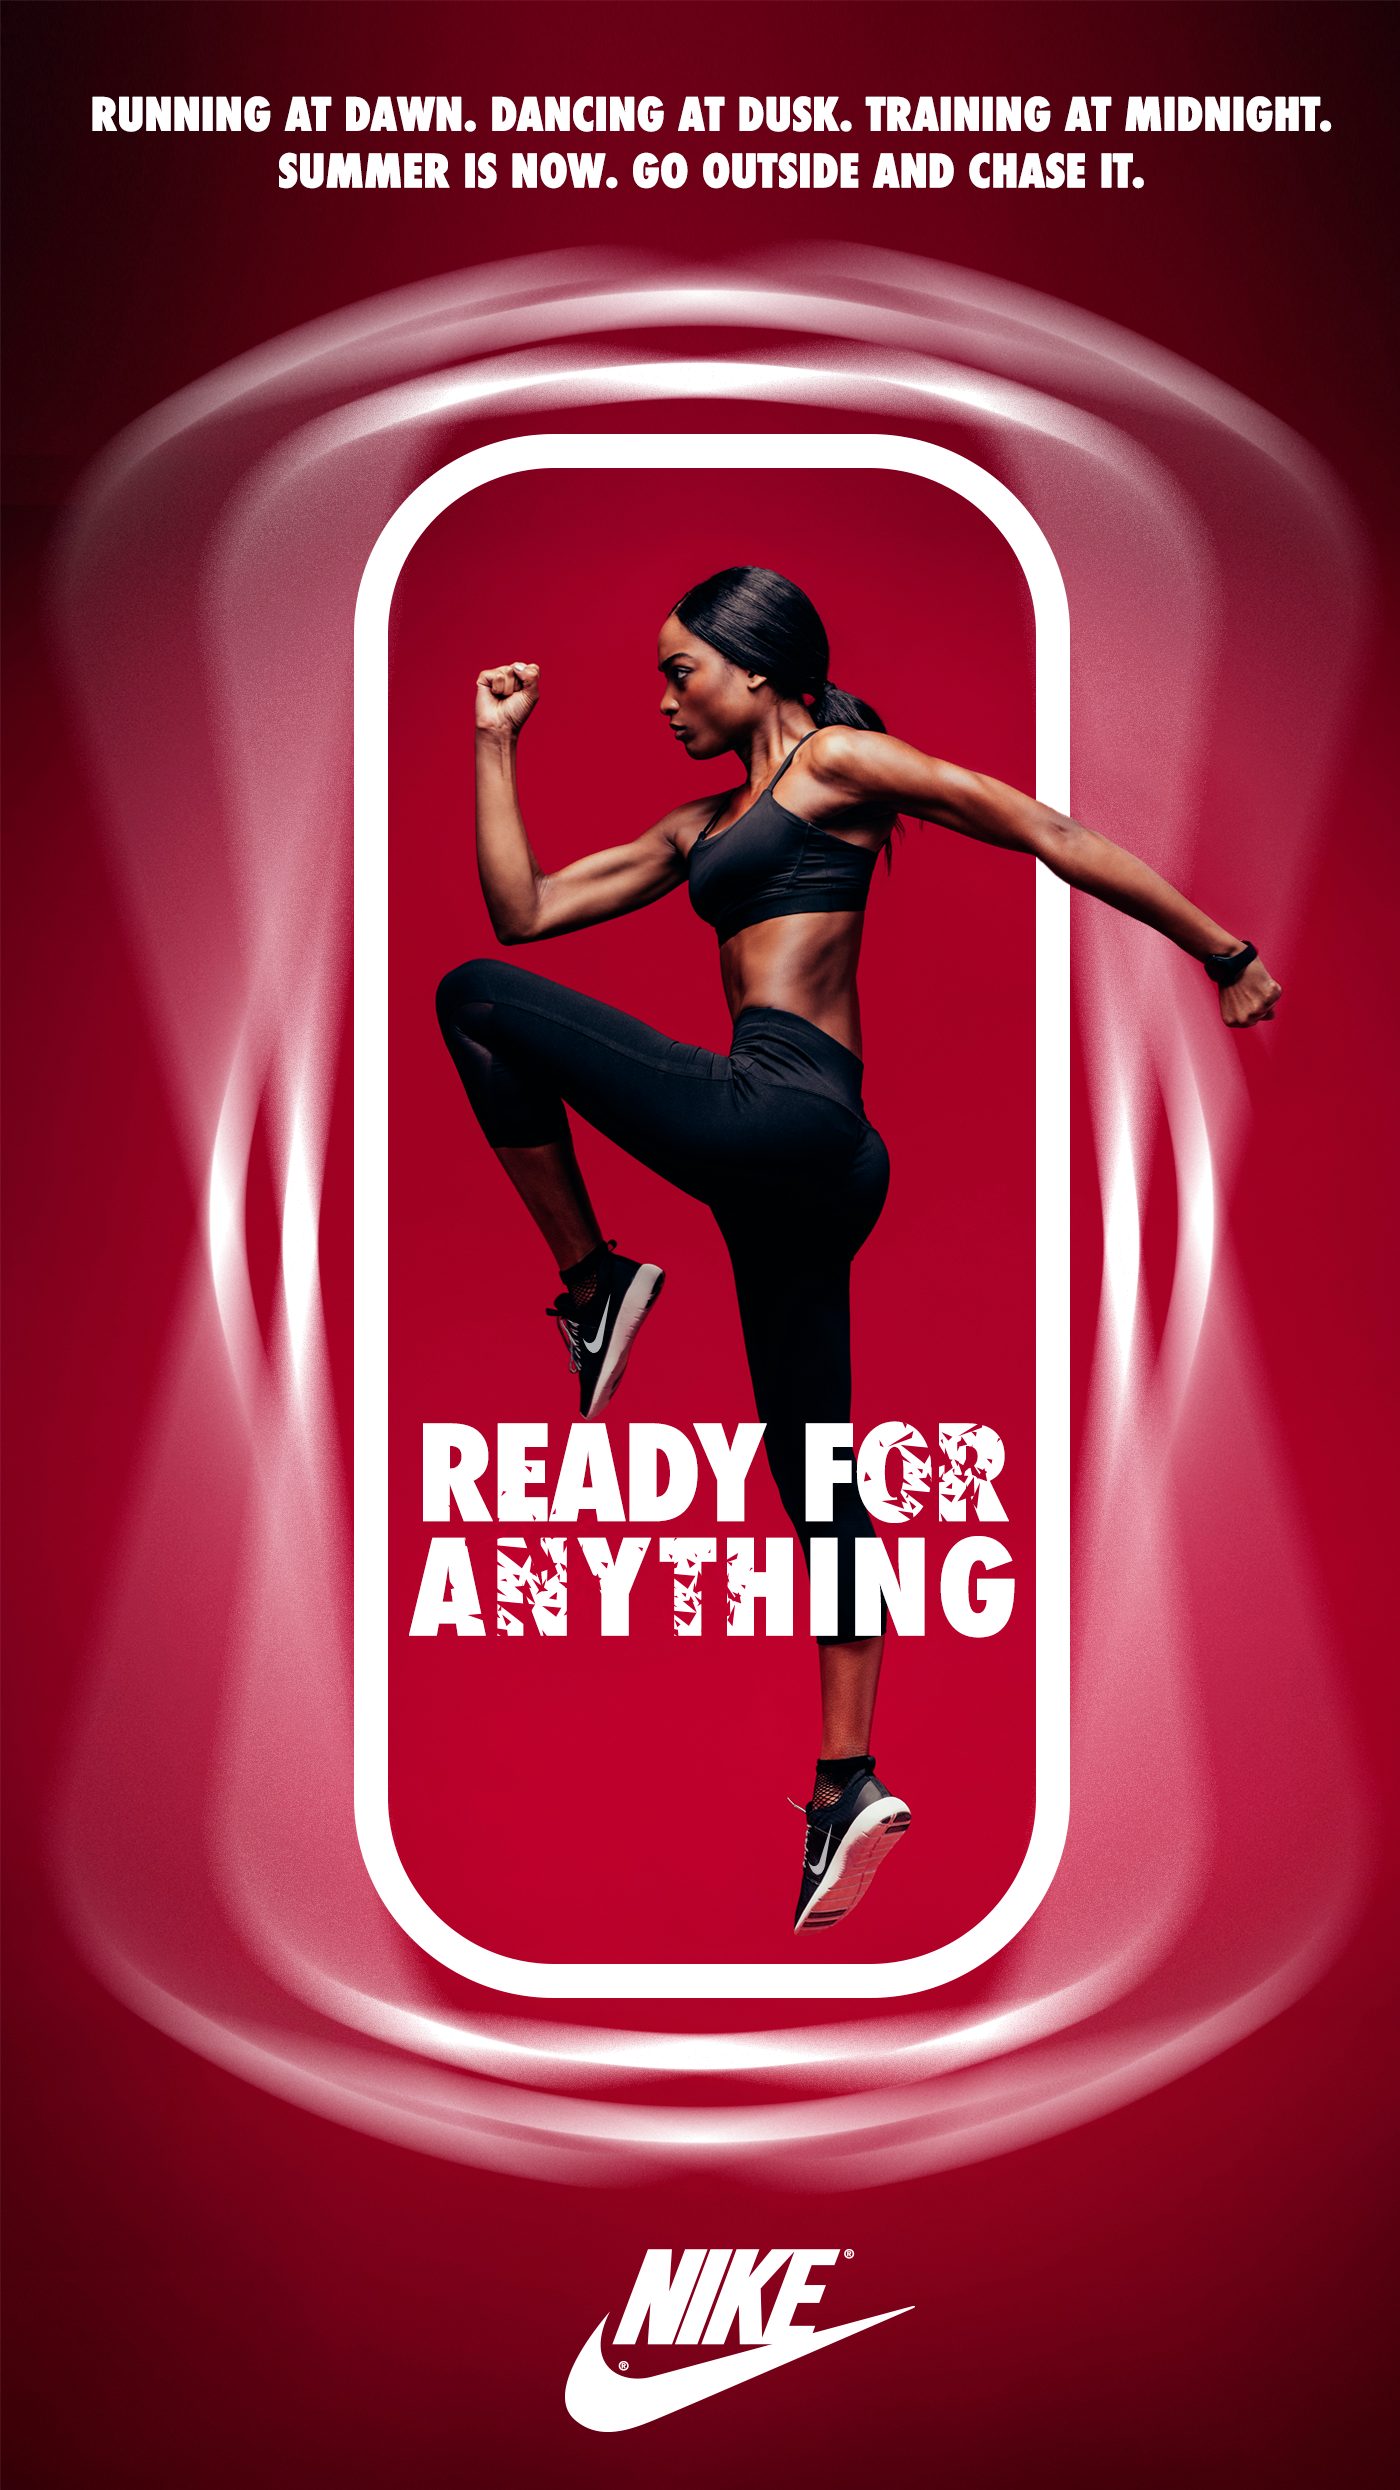 Nike sports advertasing print design running billboard